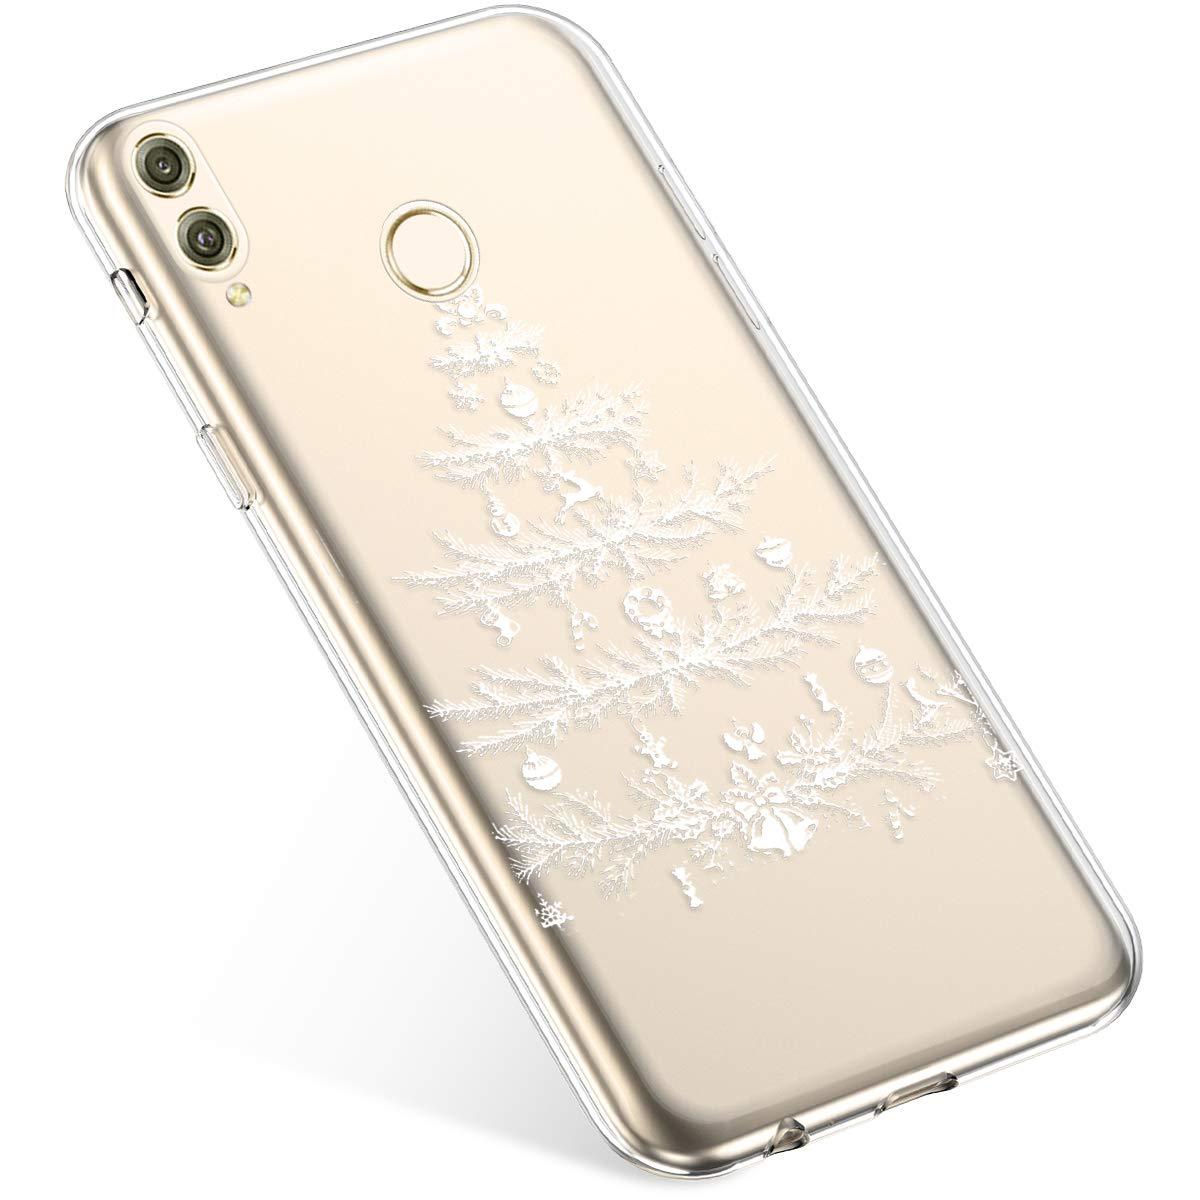 Uposao Handyhülle Huawei Honor 8X Max Schutzhülle Transparent Silikon Schutzhülle Handytasche Crystal Clear Durchsichtige Hülle TPU Cover Weich TPU Bumper Case, Weiß Schneeflocken PYHT00031212